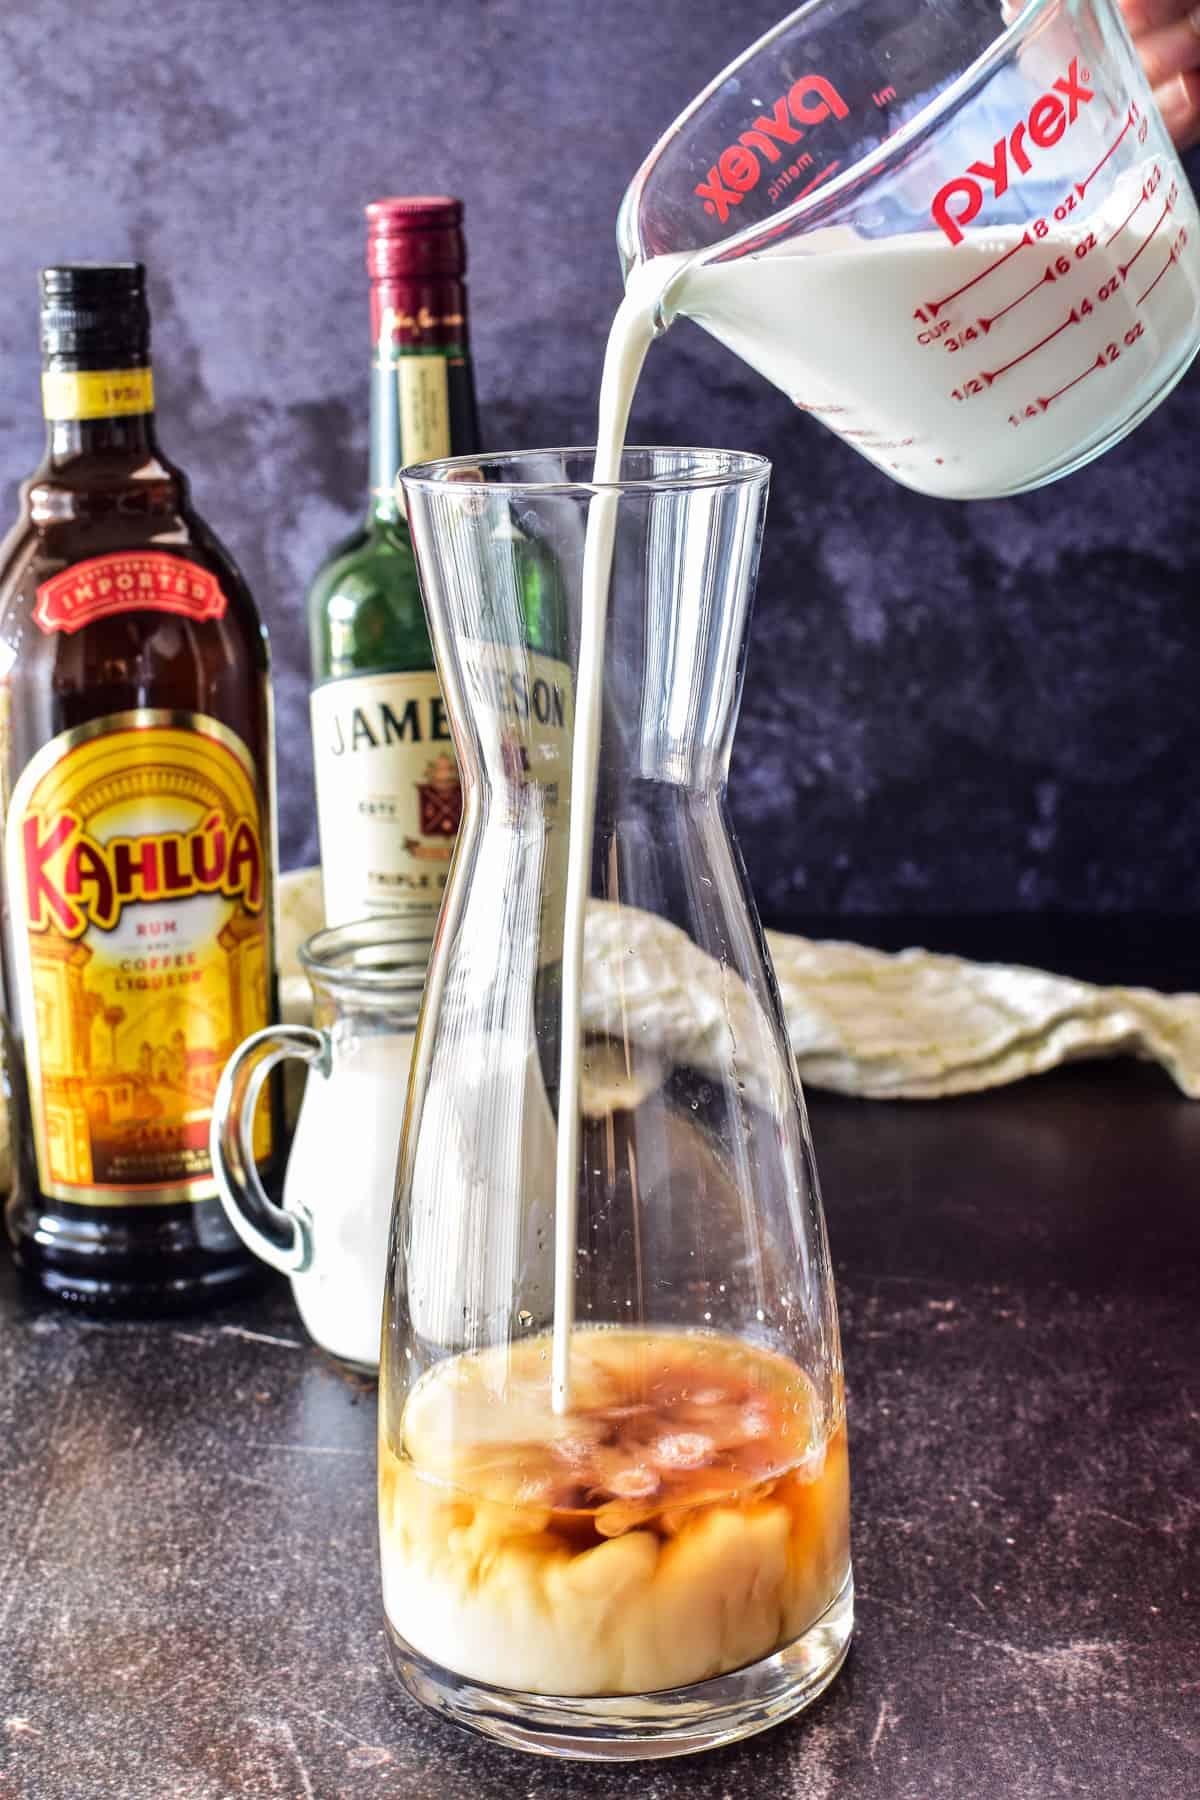 Adding half & half to carafe with whiskey for Irish Cream recipe